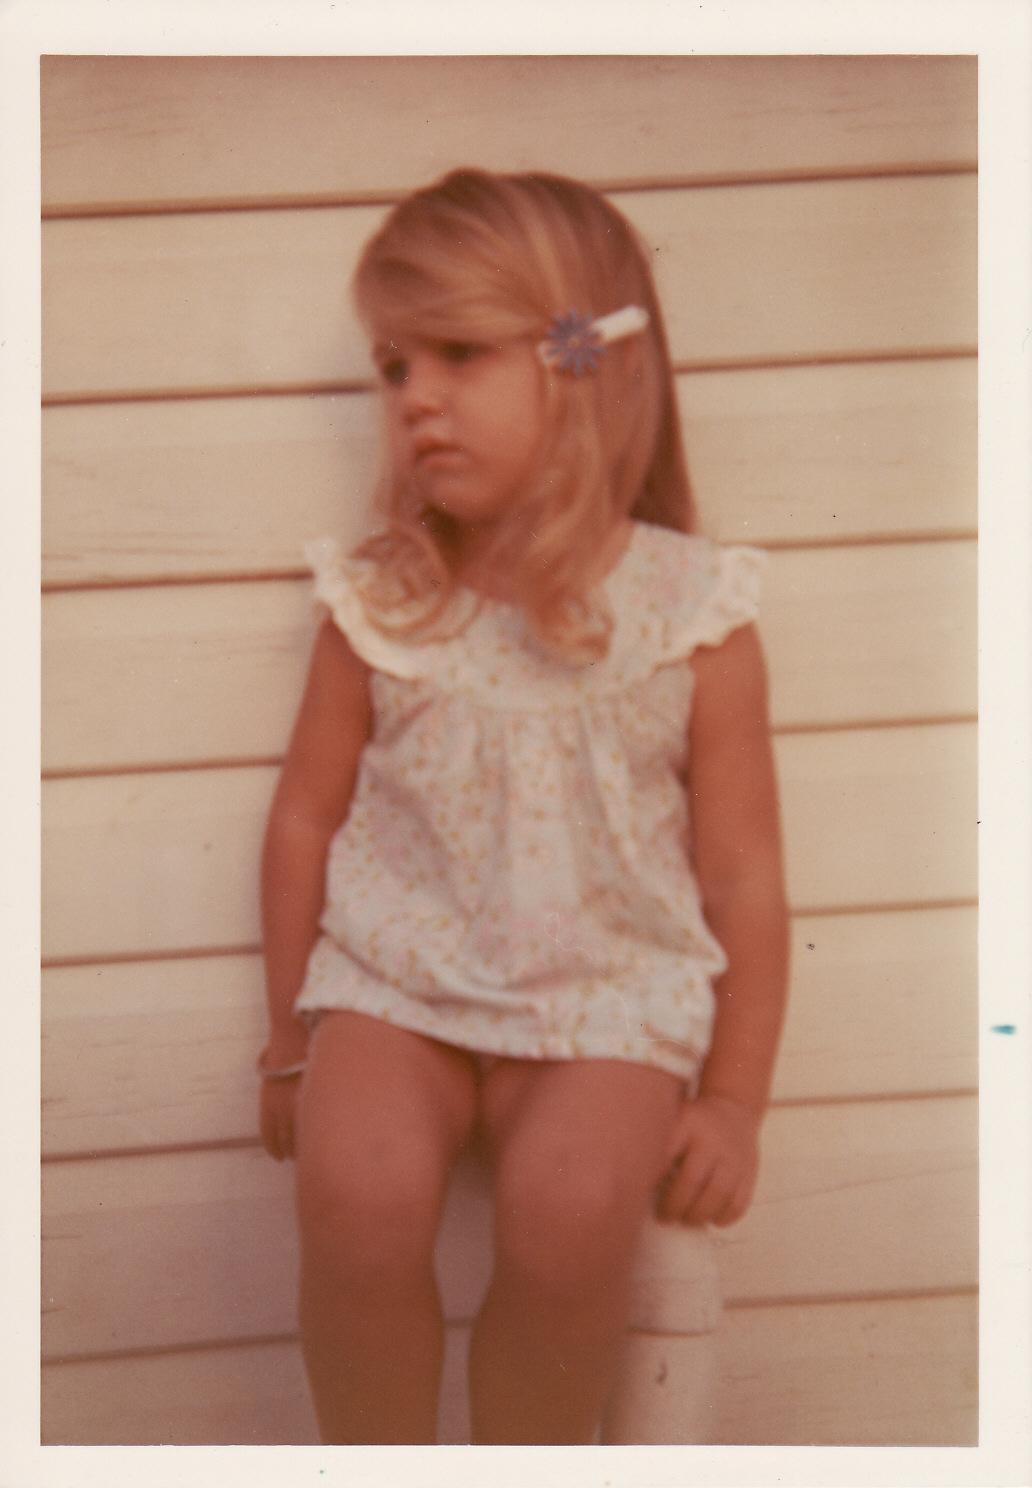 Young tiny teen squirting pics nude pics interracial